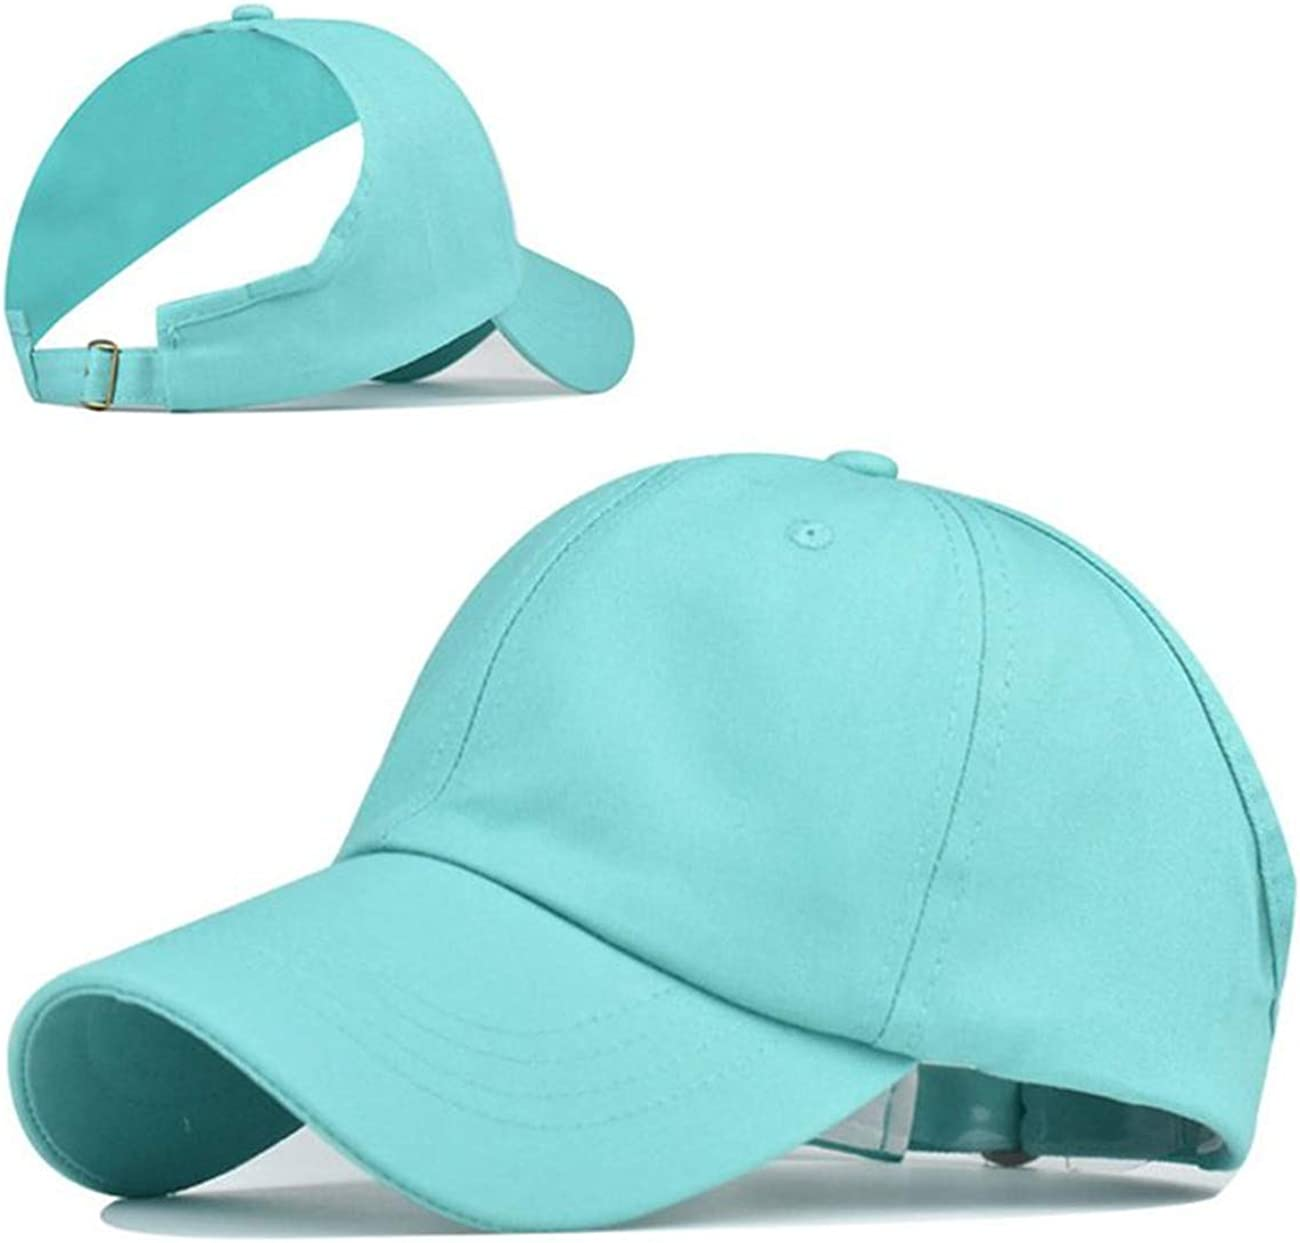 Women Backless Ponytail Hats Summer High Messy Bun Baseball Caps Sun Visor Caps